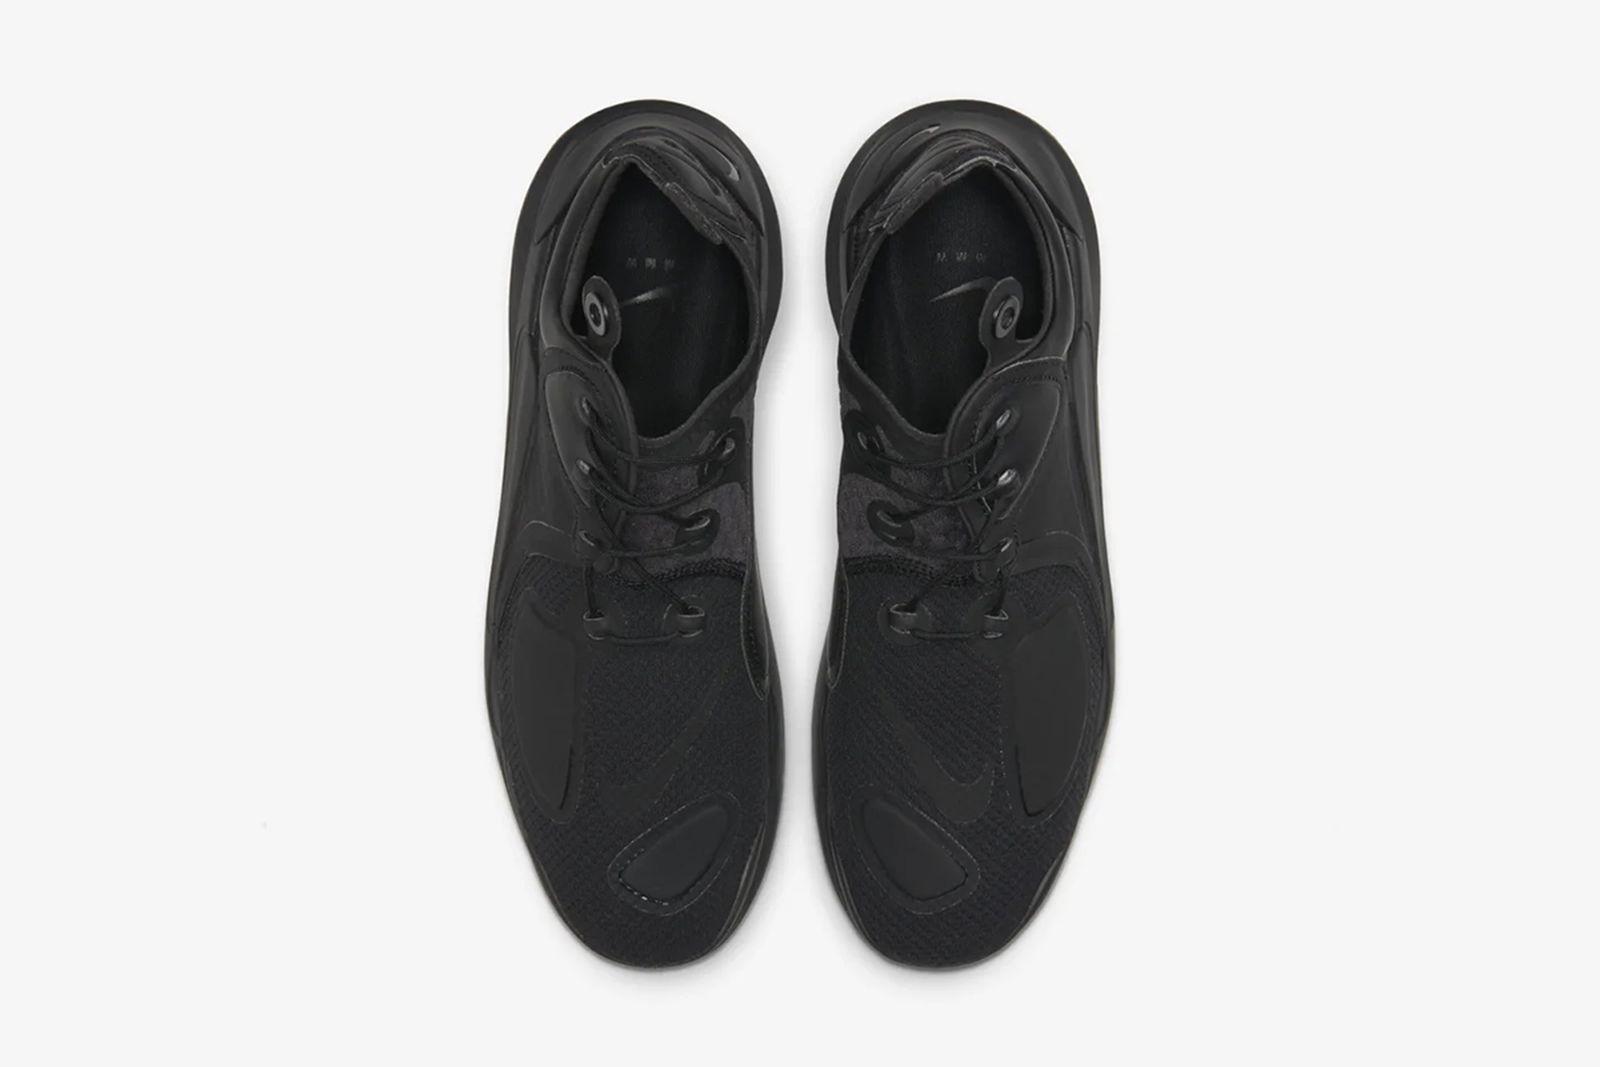 Nike x MMW Joyride Setter